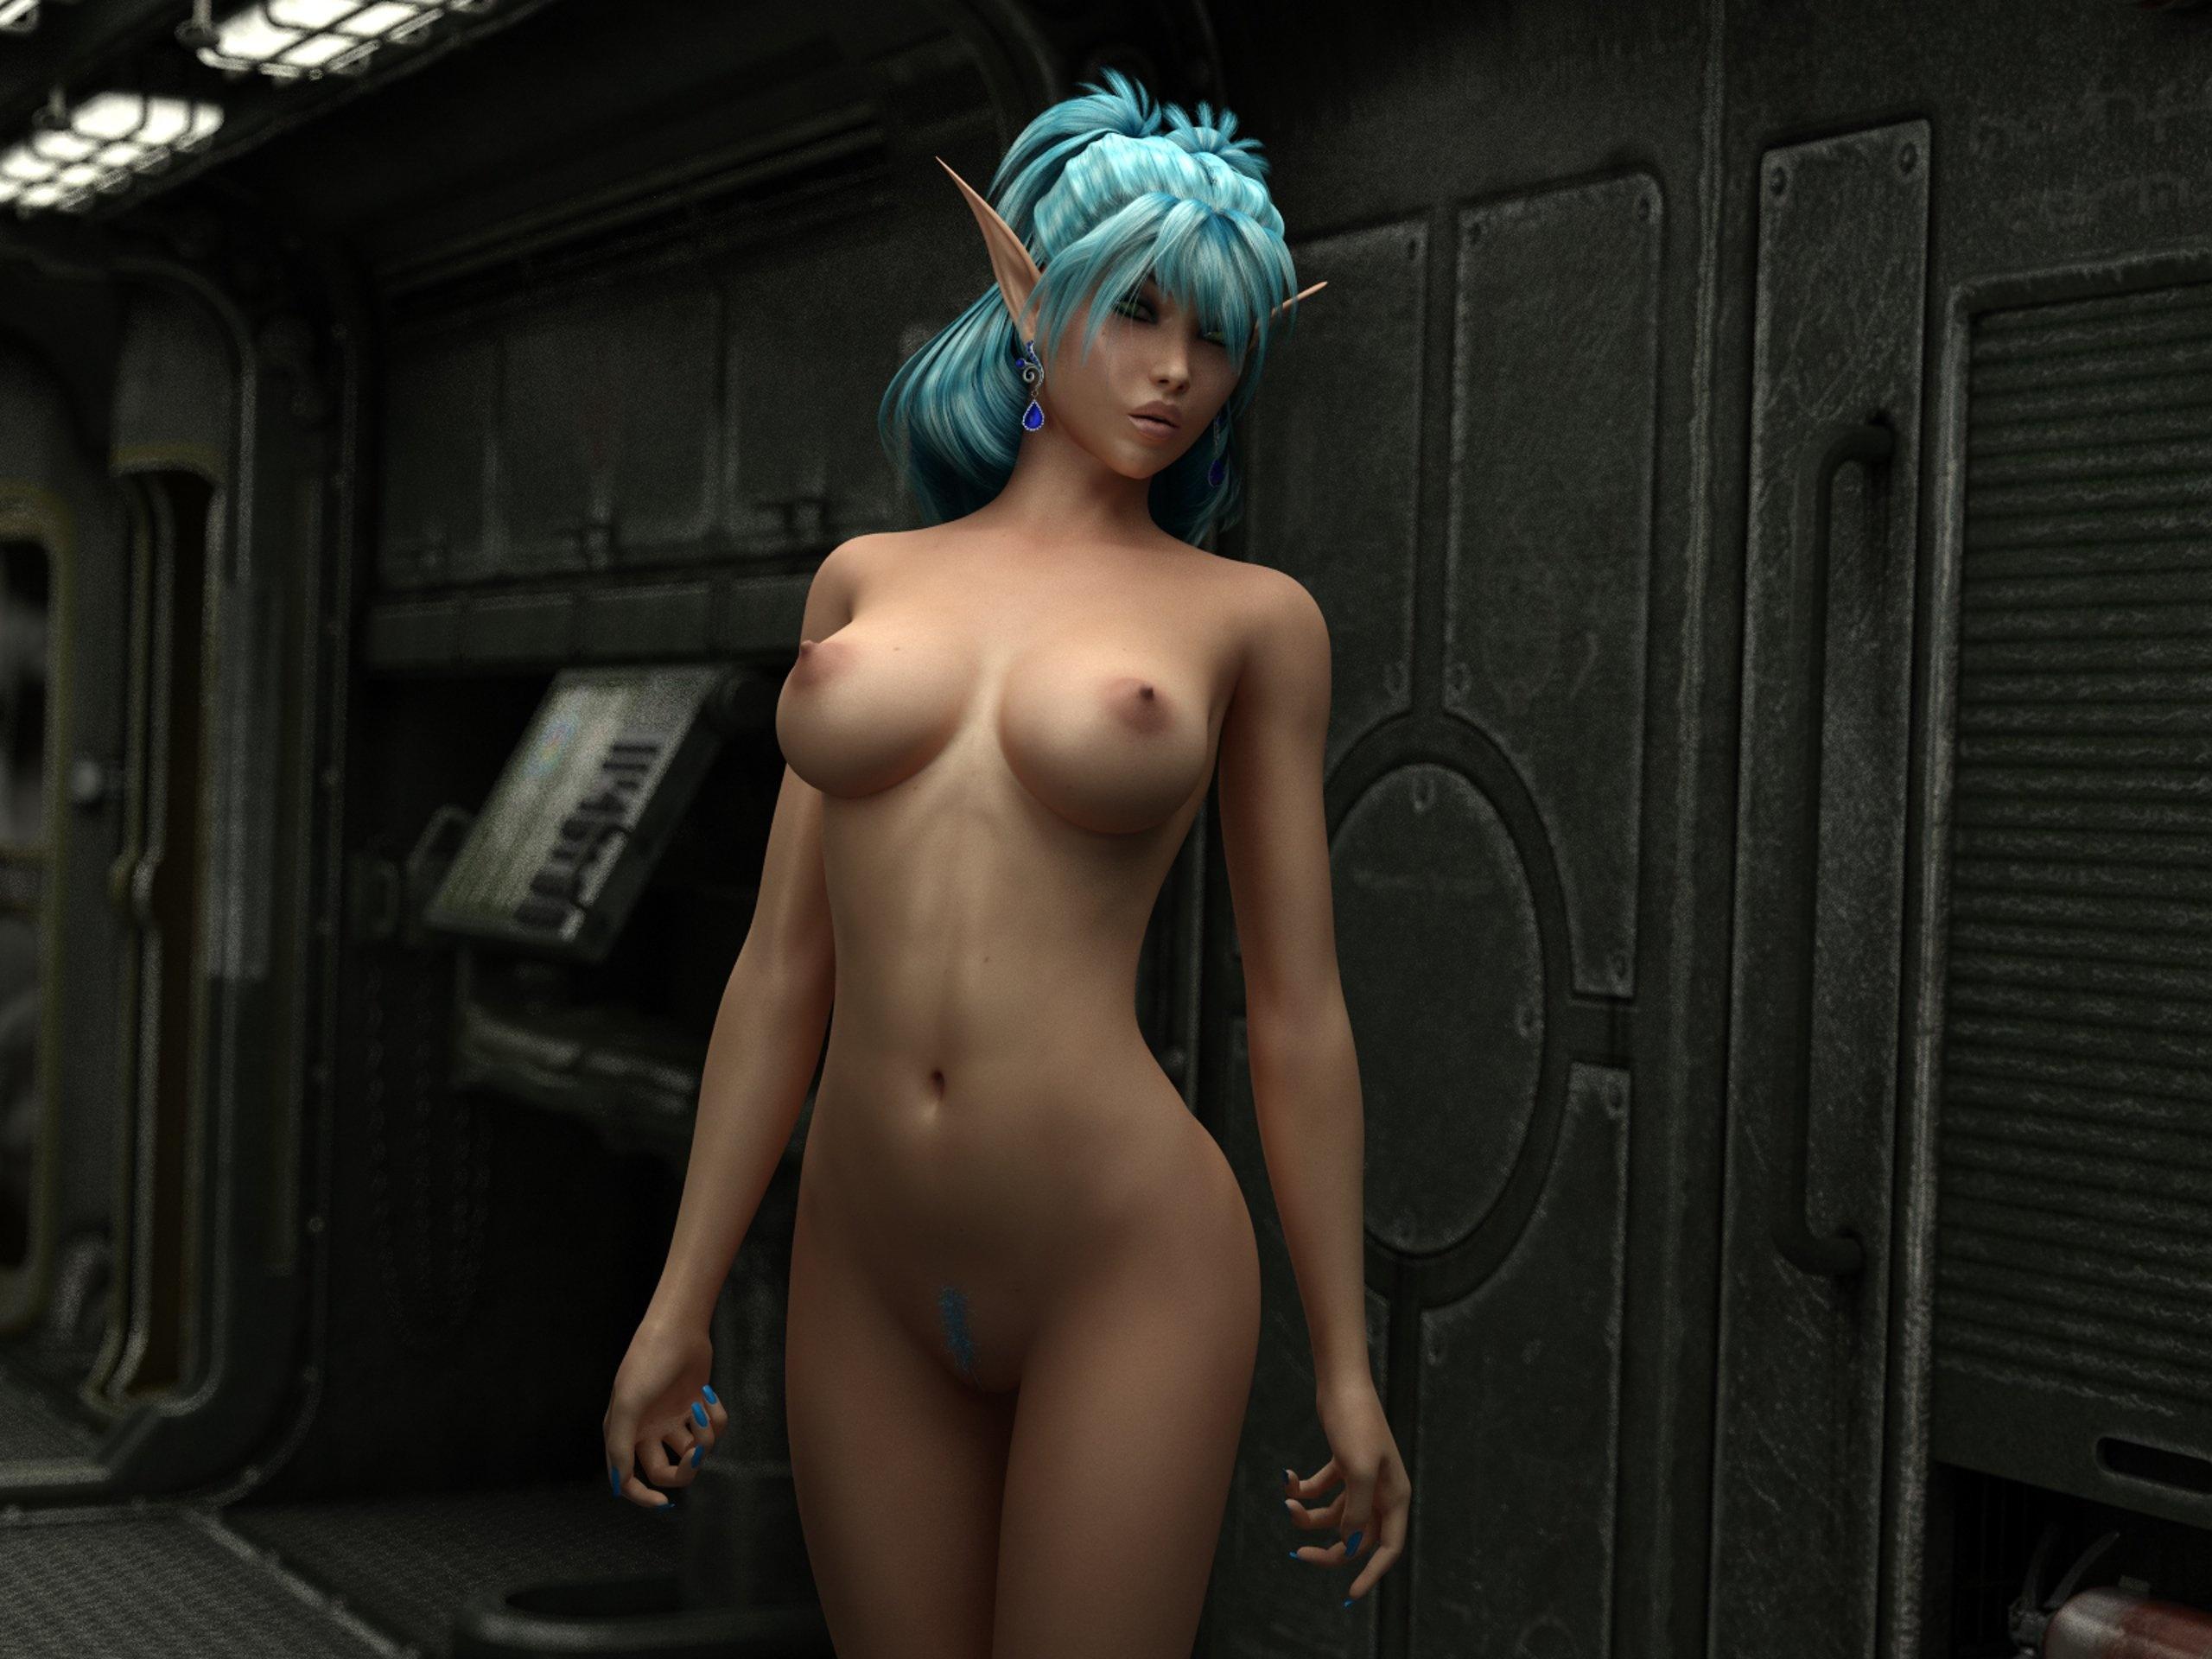 Kaley cuoco naked strapon